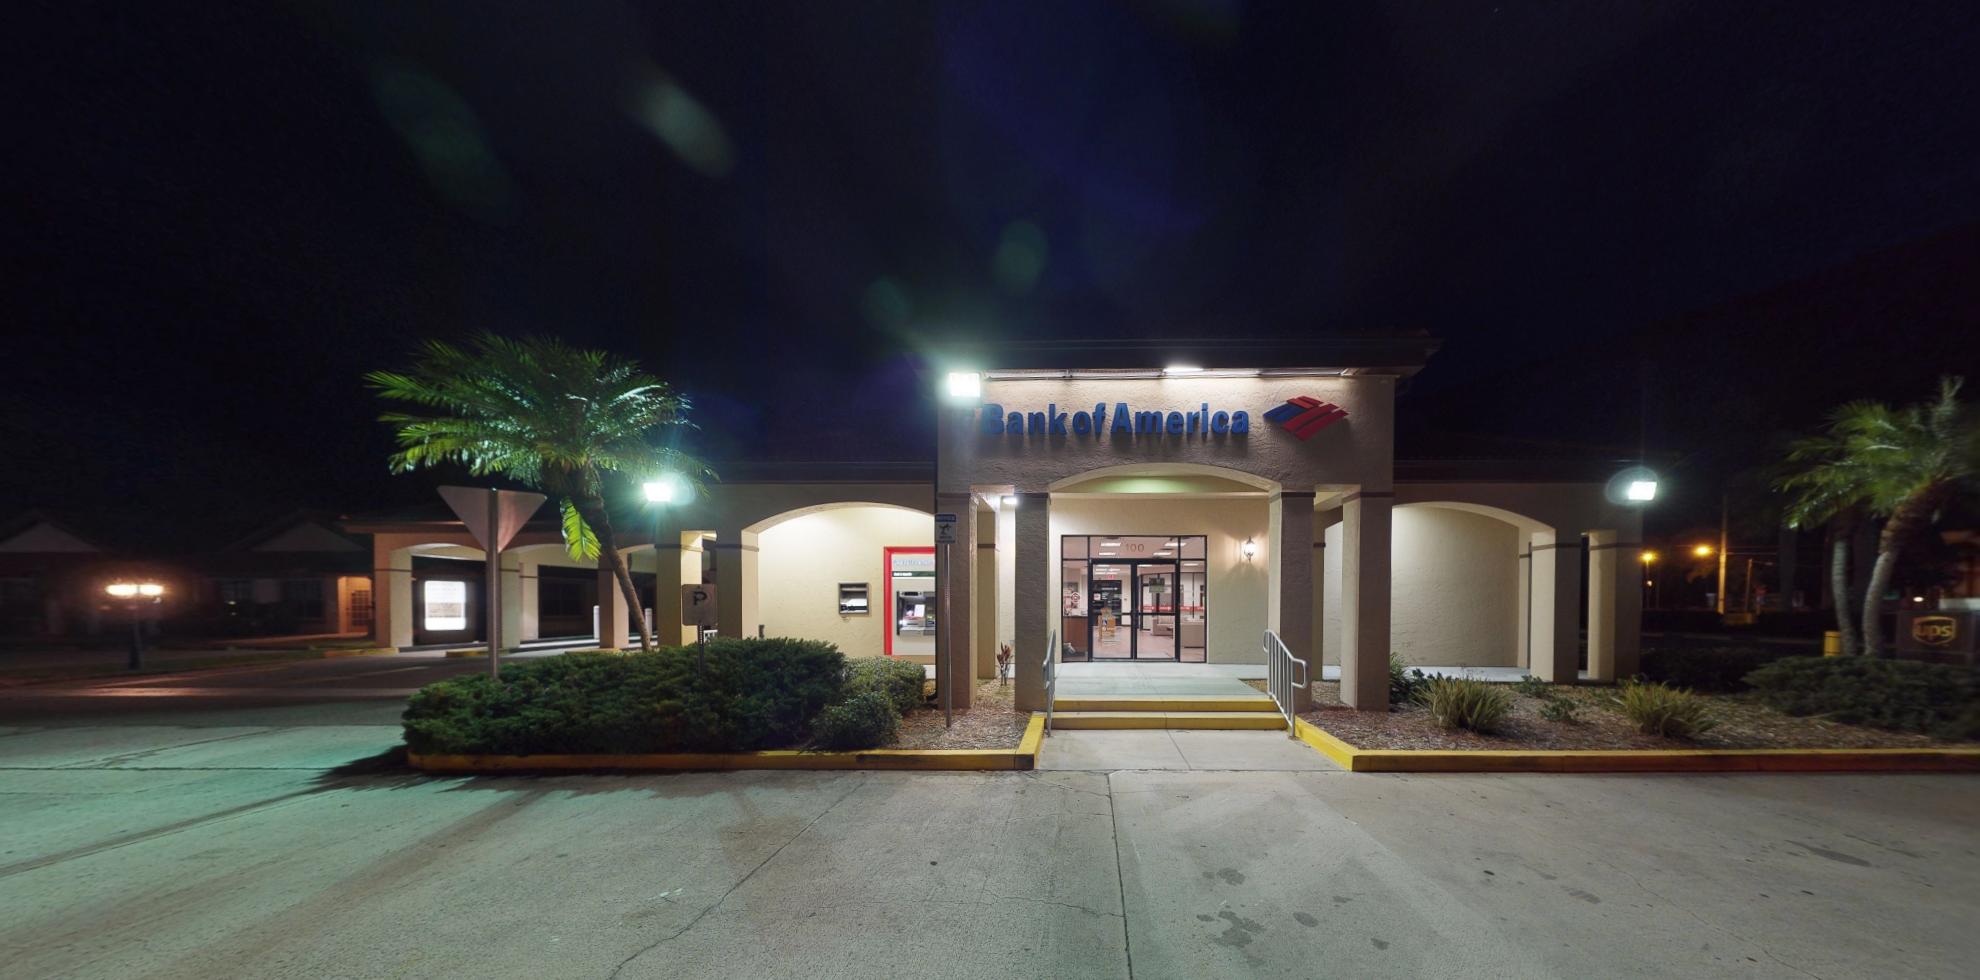 Bank of America financial center with drive-thru ATM | 100 Madrid Blvd, Punta Gorda, FL 33950